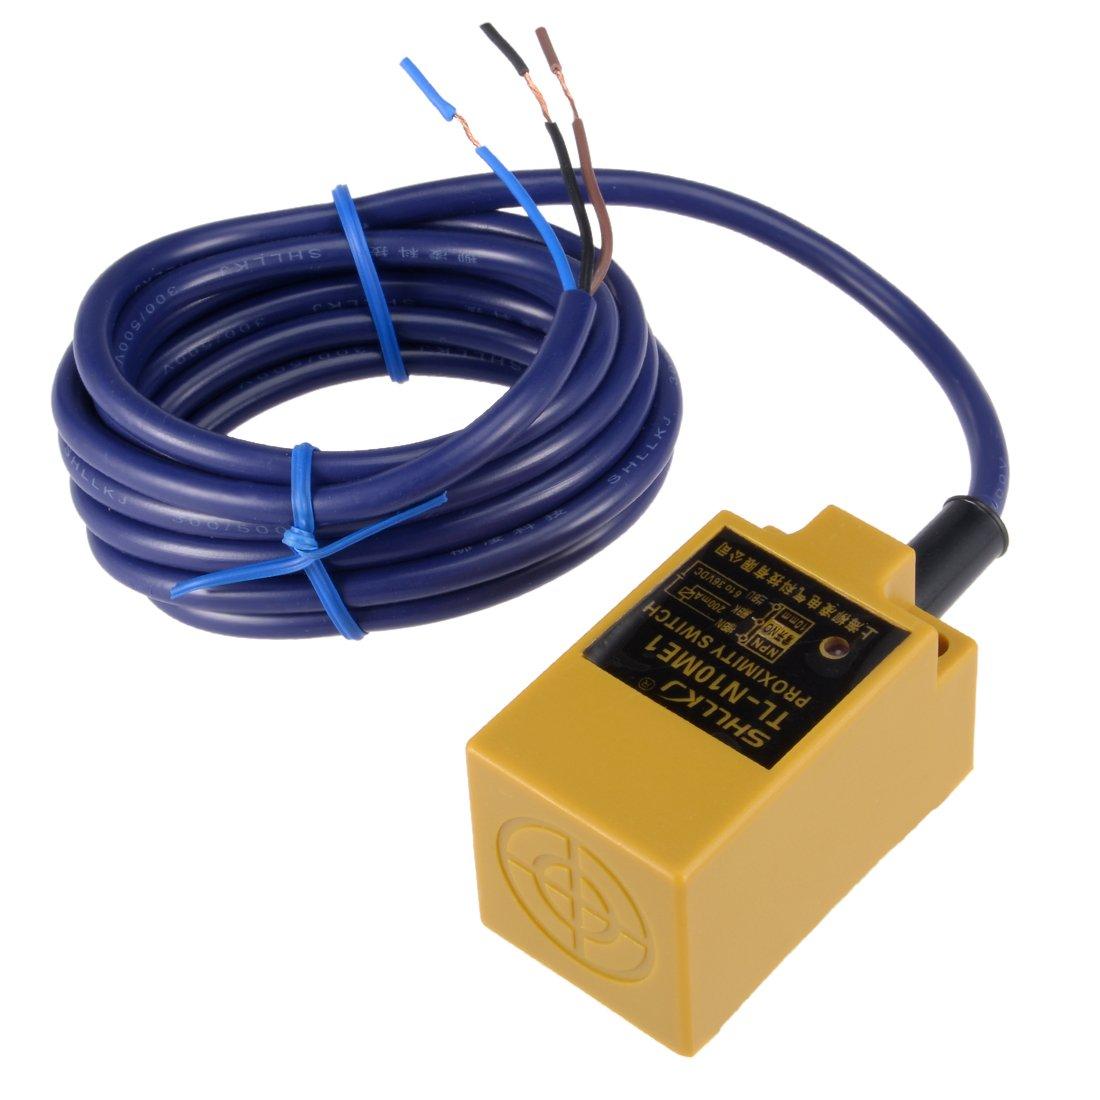 uxcell 10mm Inductive Proximity Sensor Switch Detector NPN NO DC 6-36V  200mA 3-Wire TL-N10ME1: Amazon.com: Industrial & Scientific